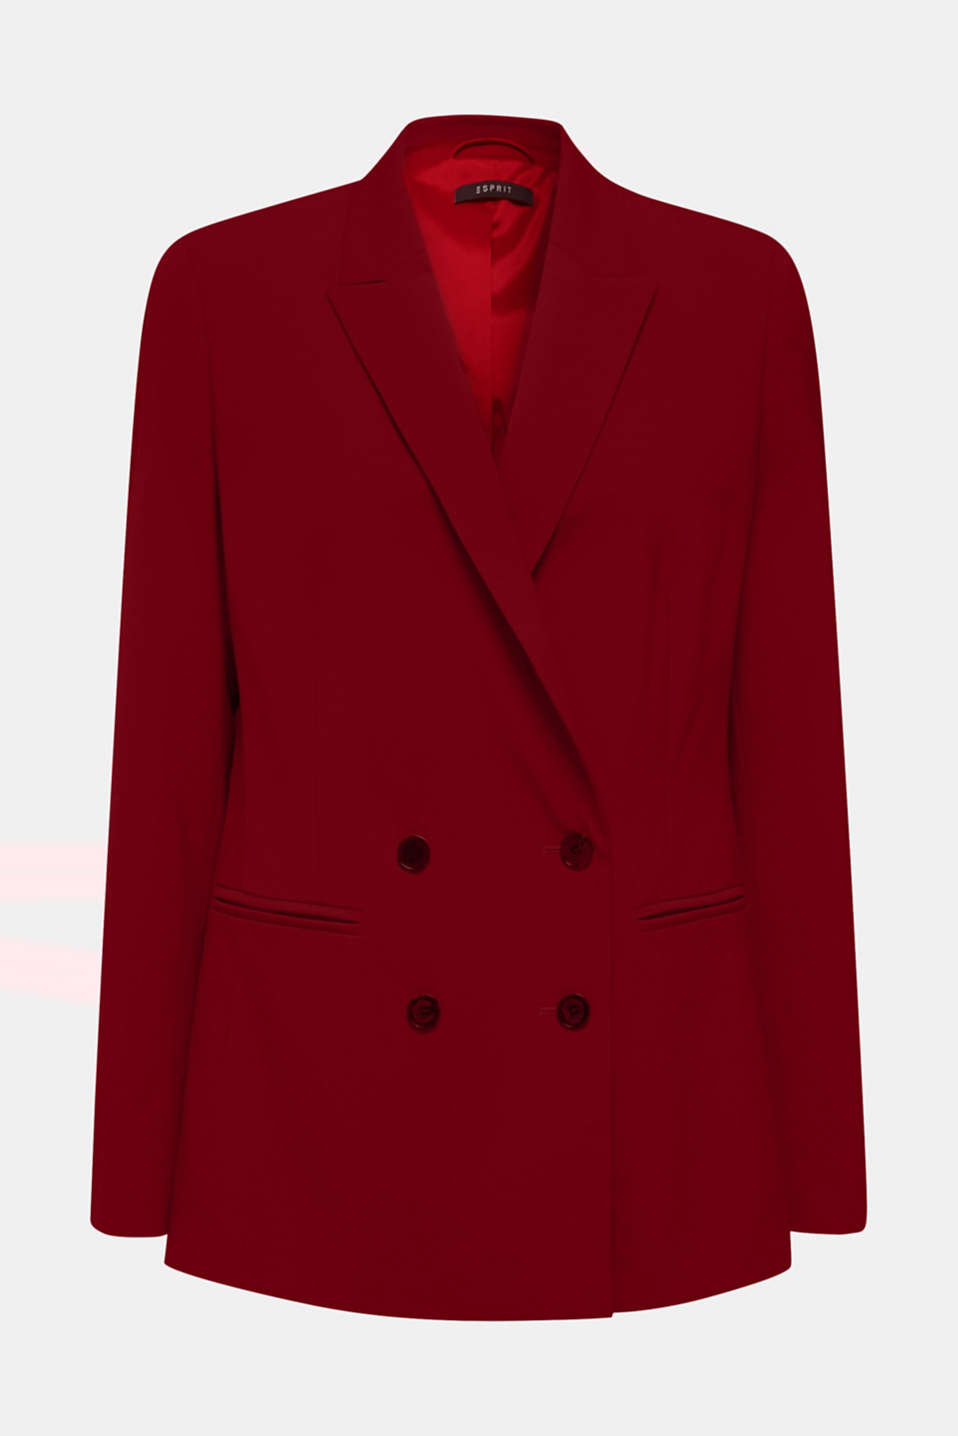 STRETCH FABRIC Mix + Match stretch blazer, DARK RED, detail image number 7